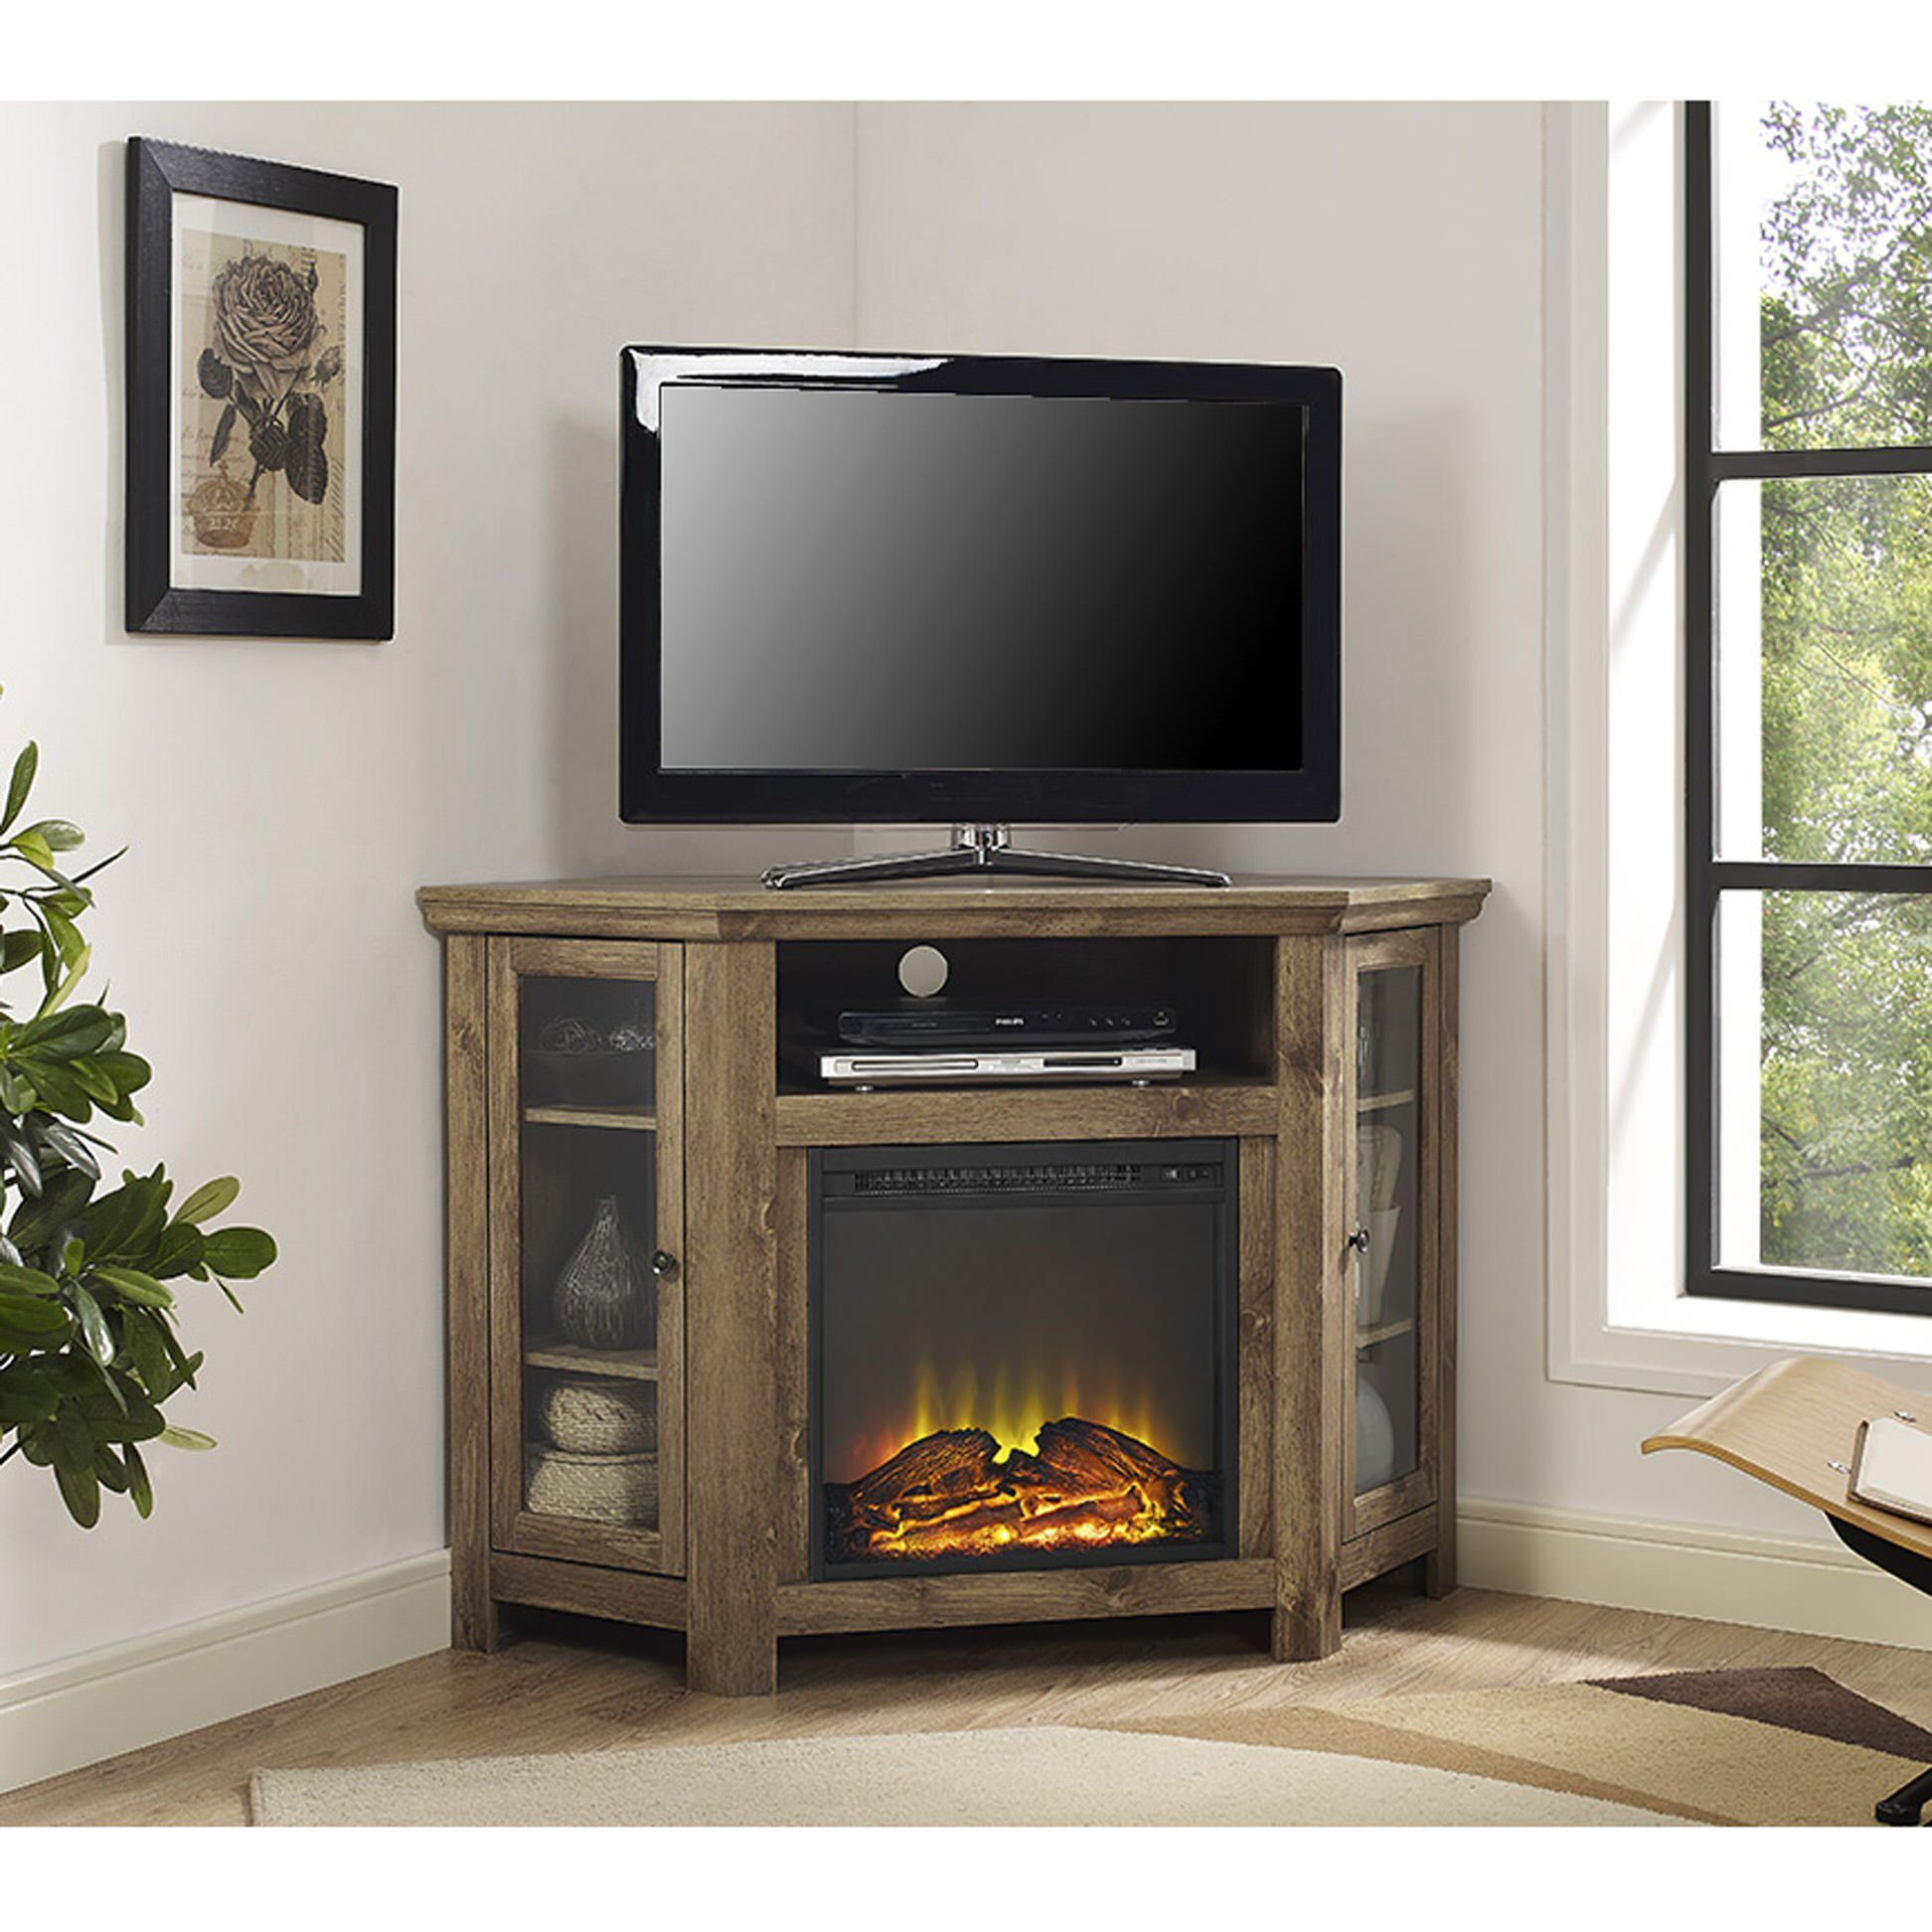 Jackson 48 Inch Corner Fireplace Tv Stand Barnwood By Walker Edison Fireplace Tv Stand Corner Fireplace Tv Stand Electric Fireplace Tv Stand